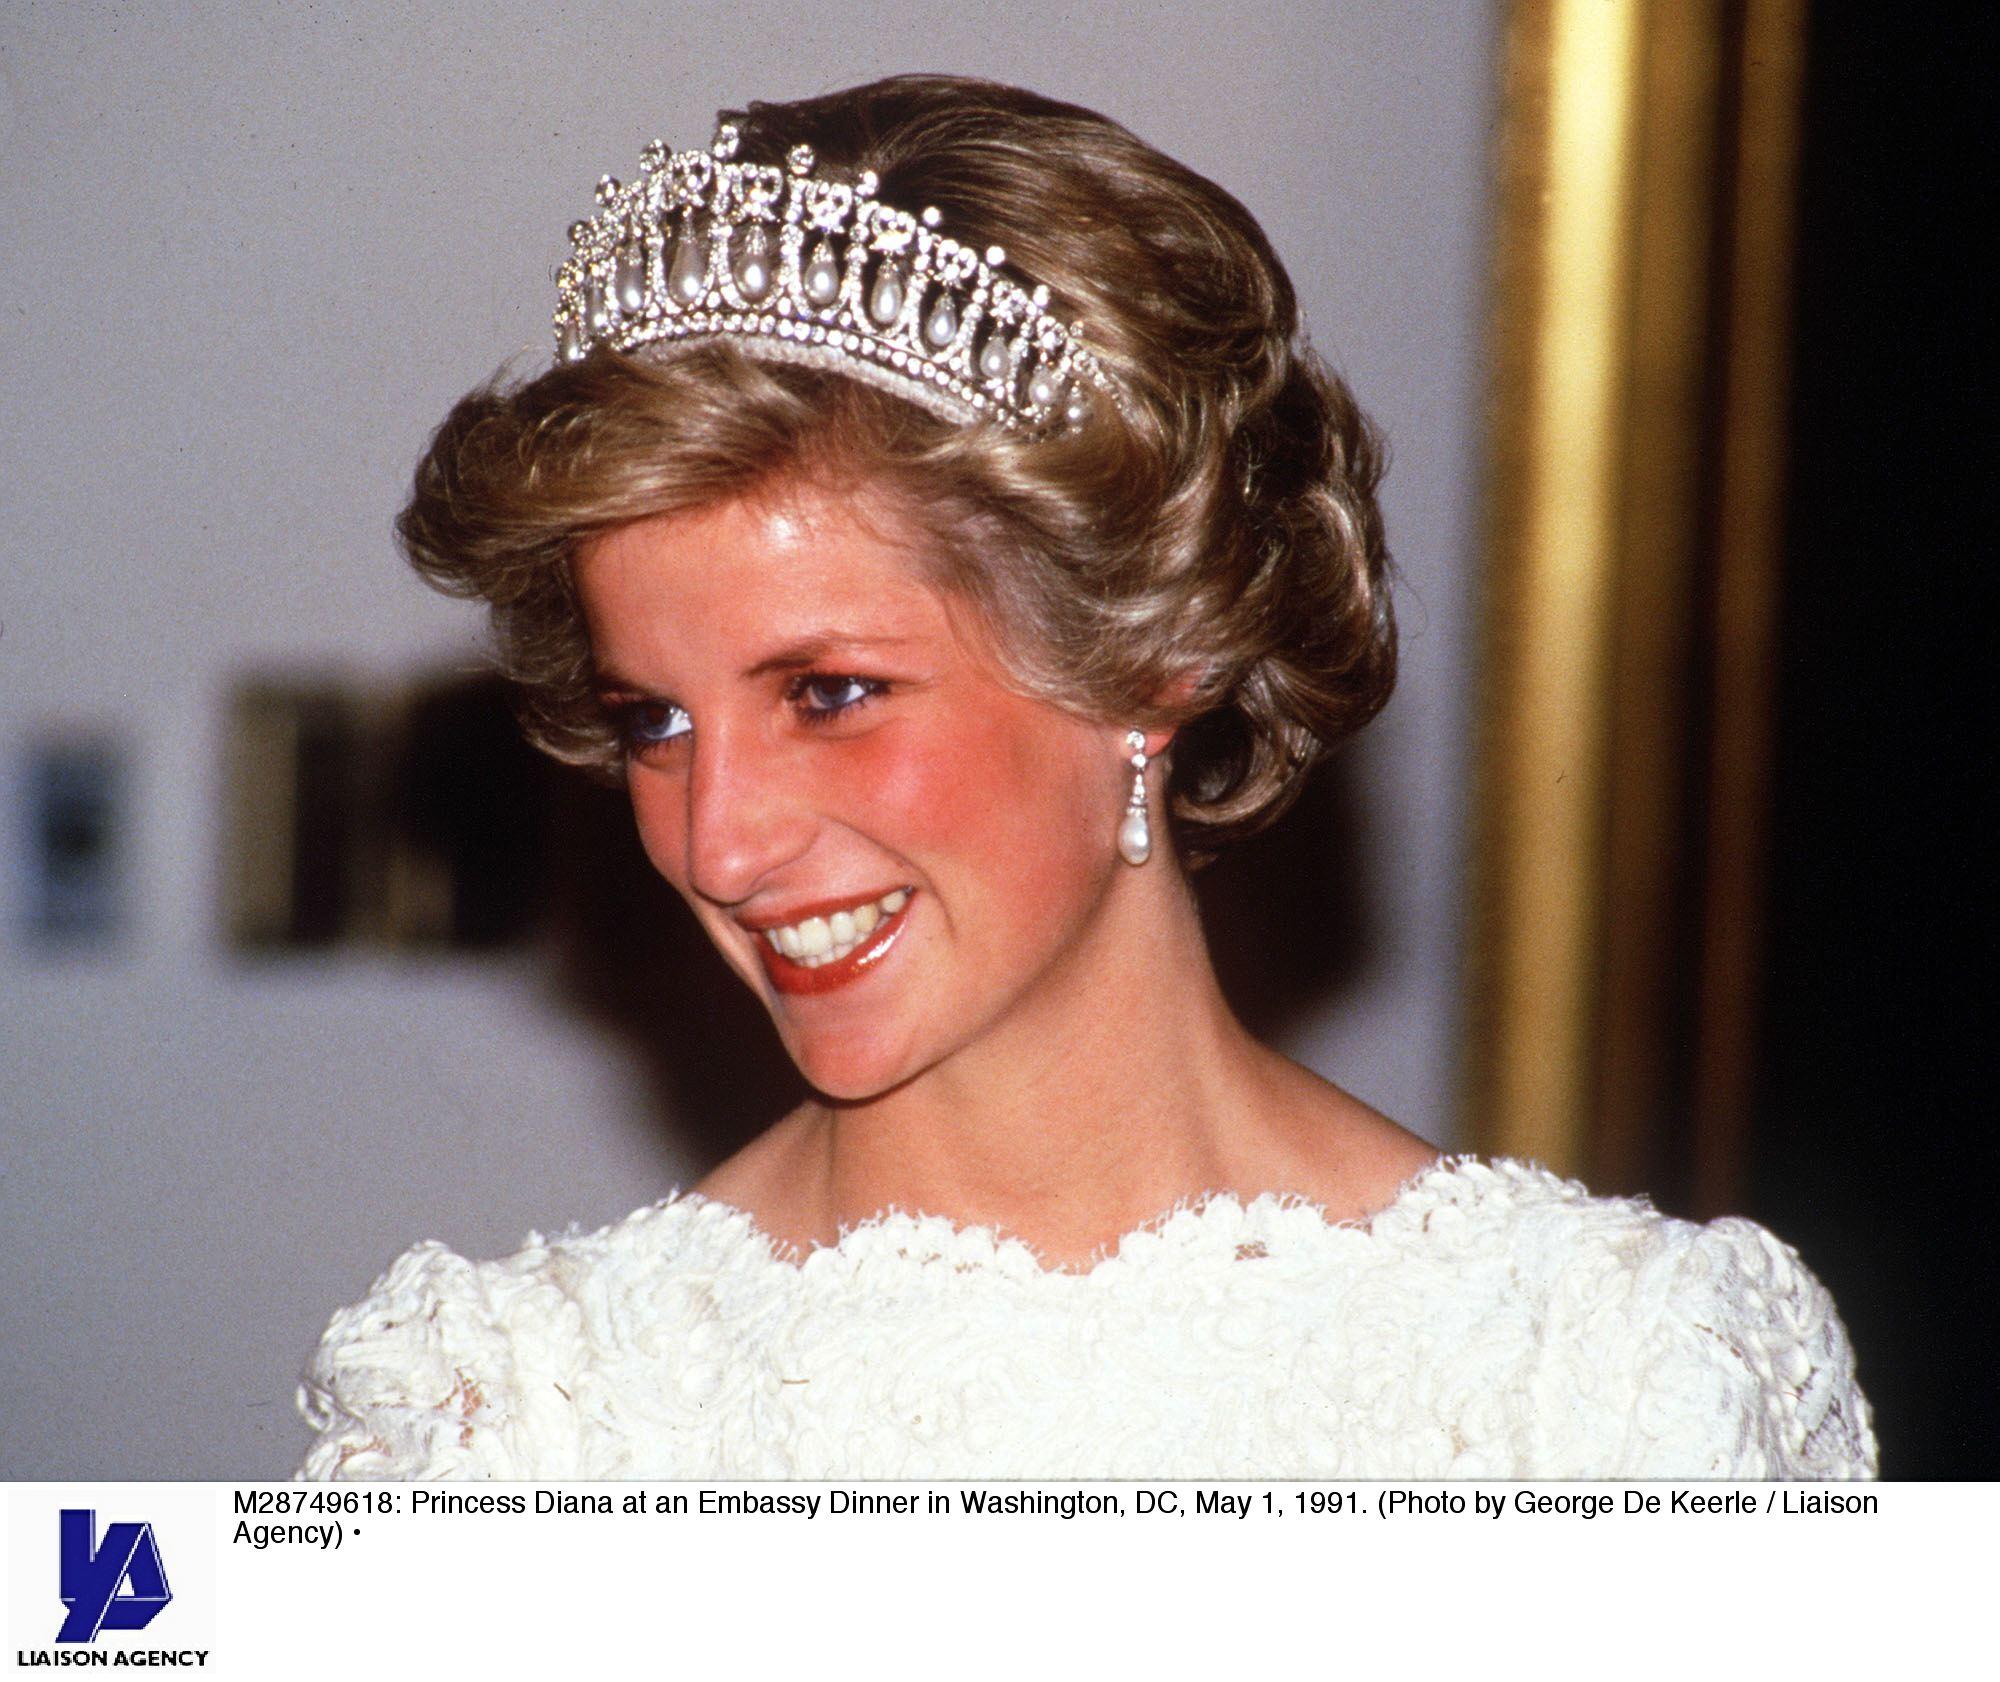 Princess Diana Videos at ABC News Video Archive at abcnews.com